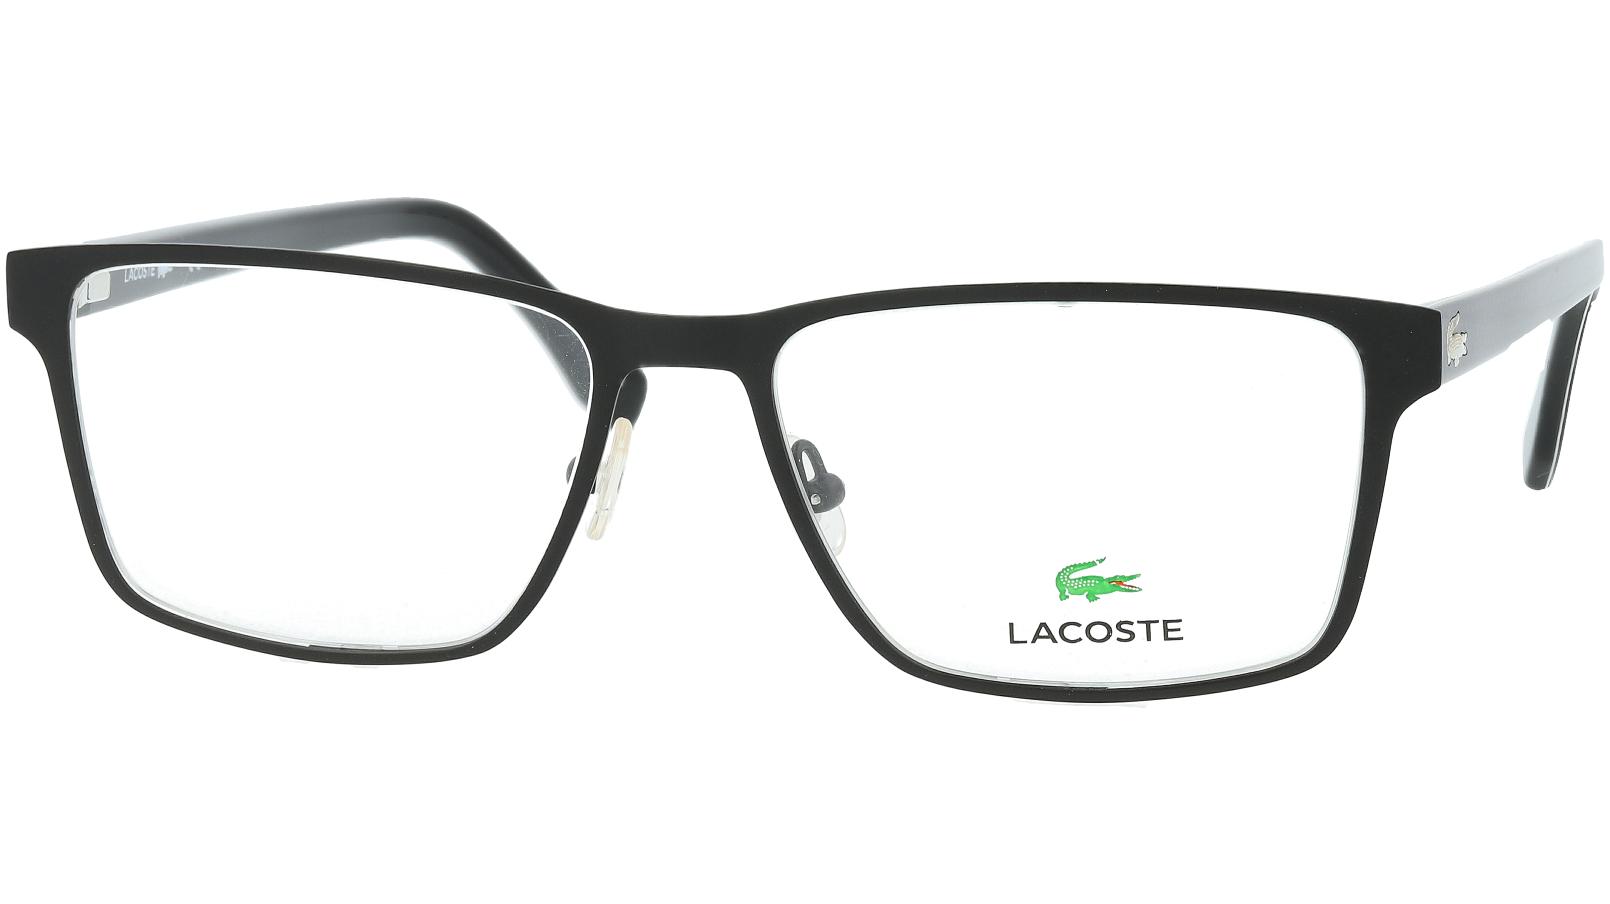 Lacoste L2205 001 54 Black Glasses